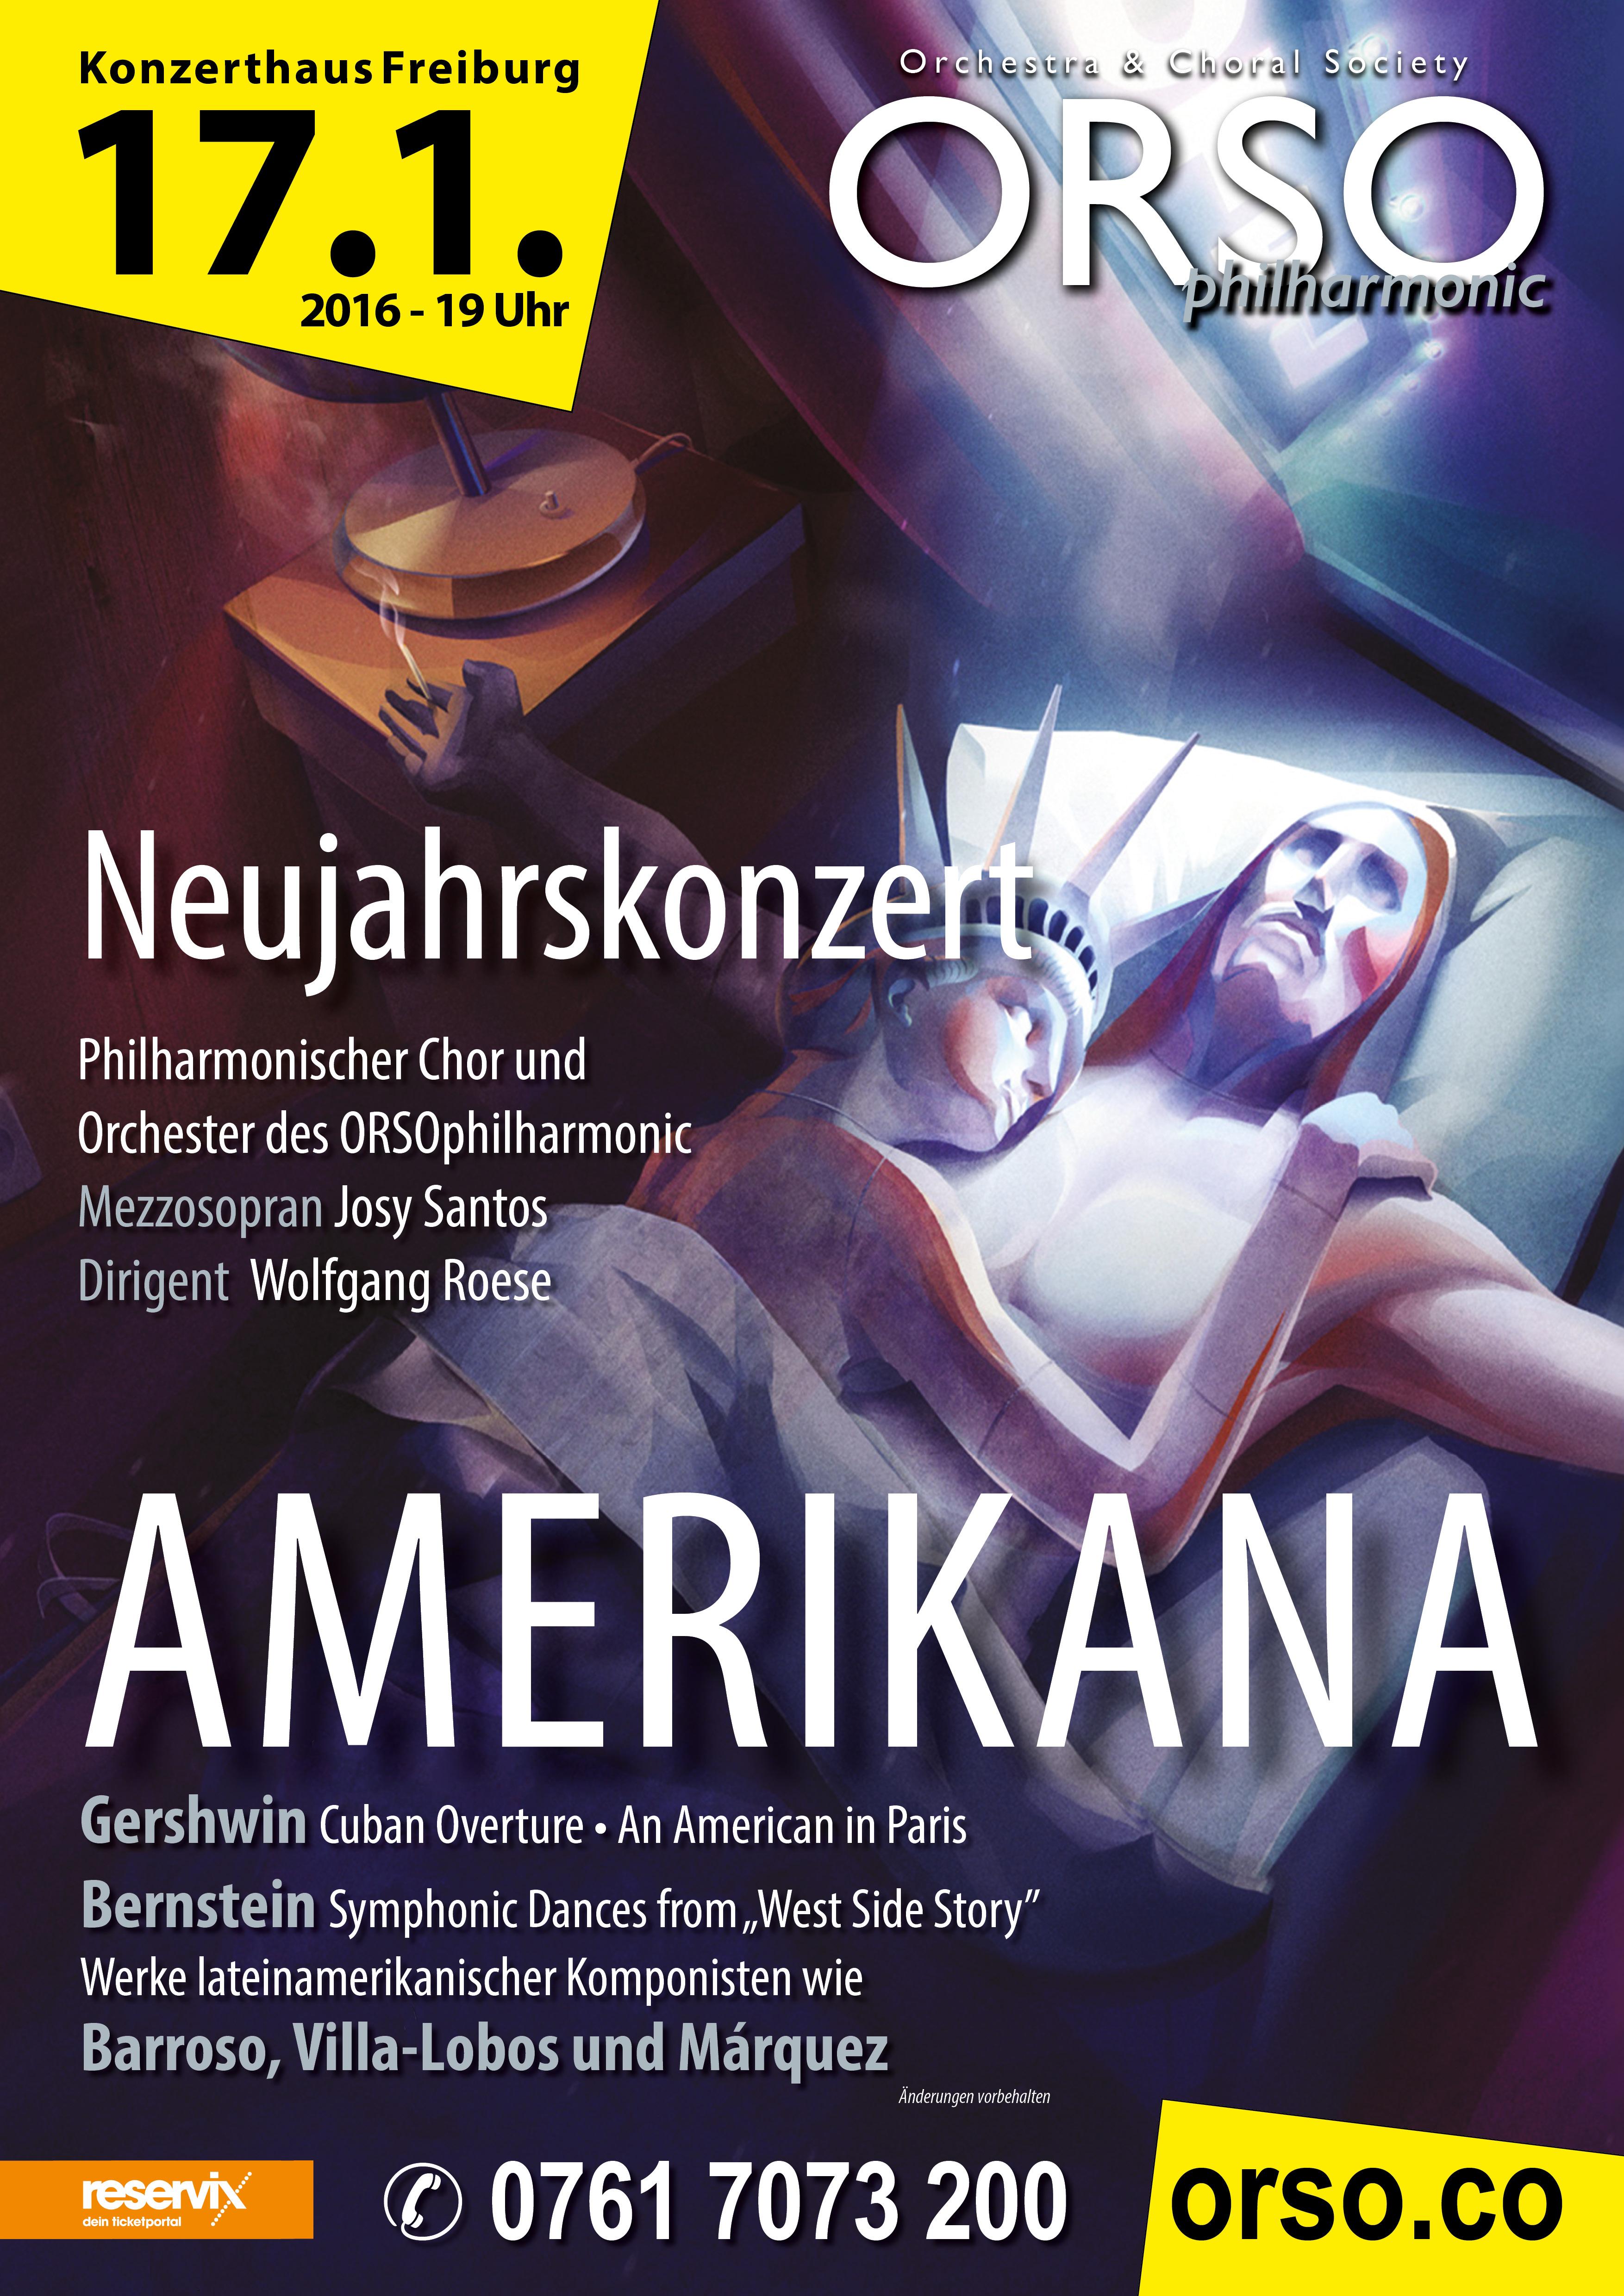 1601 AMERIKANA Plakatmotiv